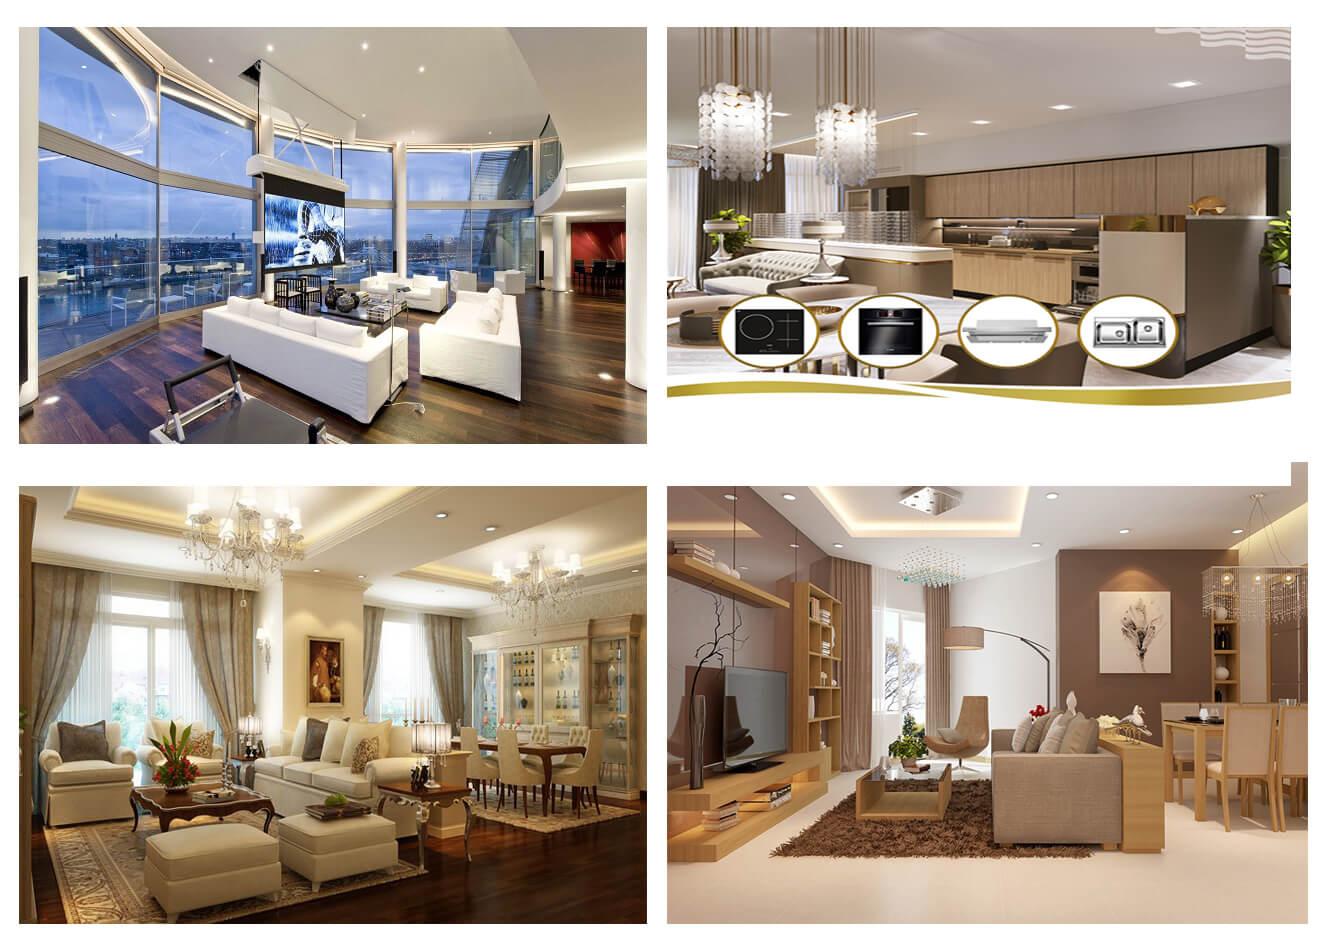 Thiết kế căn hộ mẫu Housinco Premium